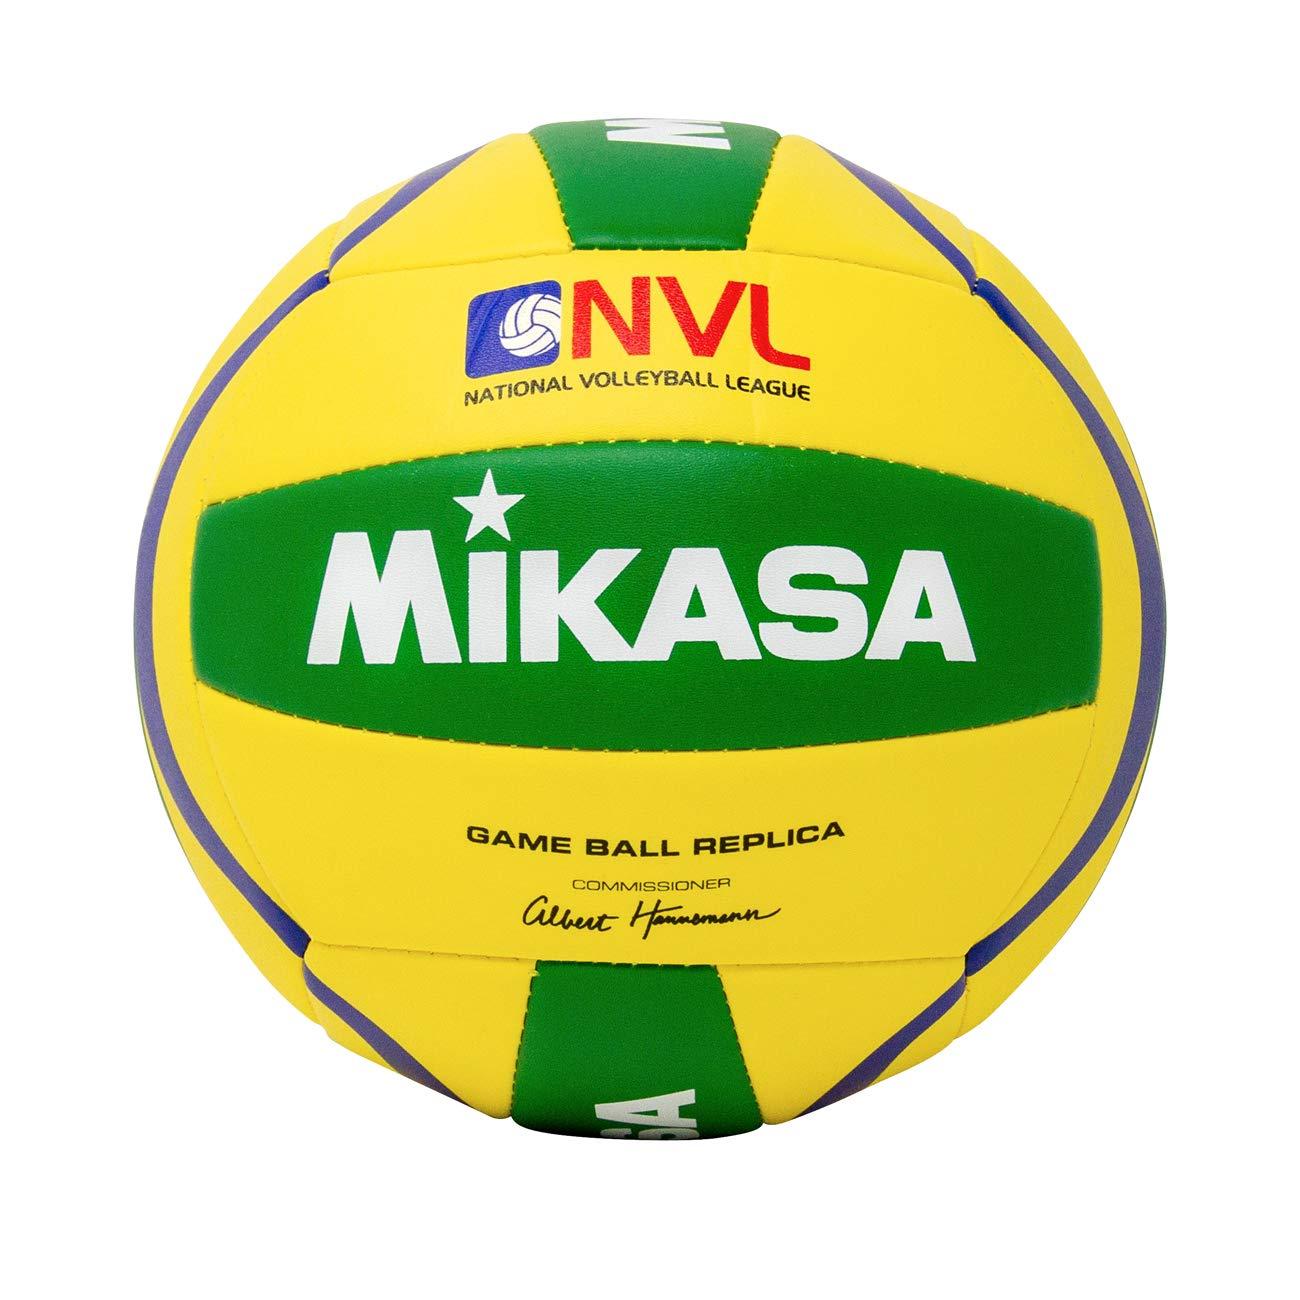 Mikasa D119 NVL Game Ball Replica Outdoor Volleyball: Amazon.es ...